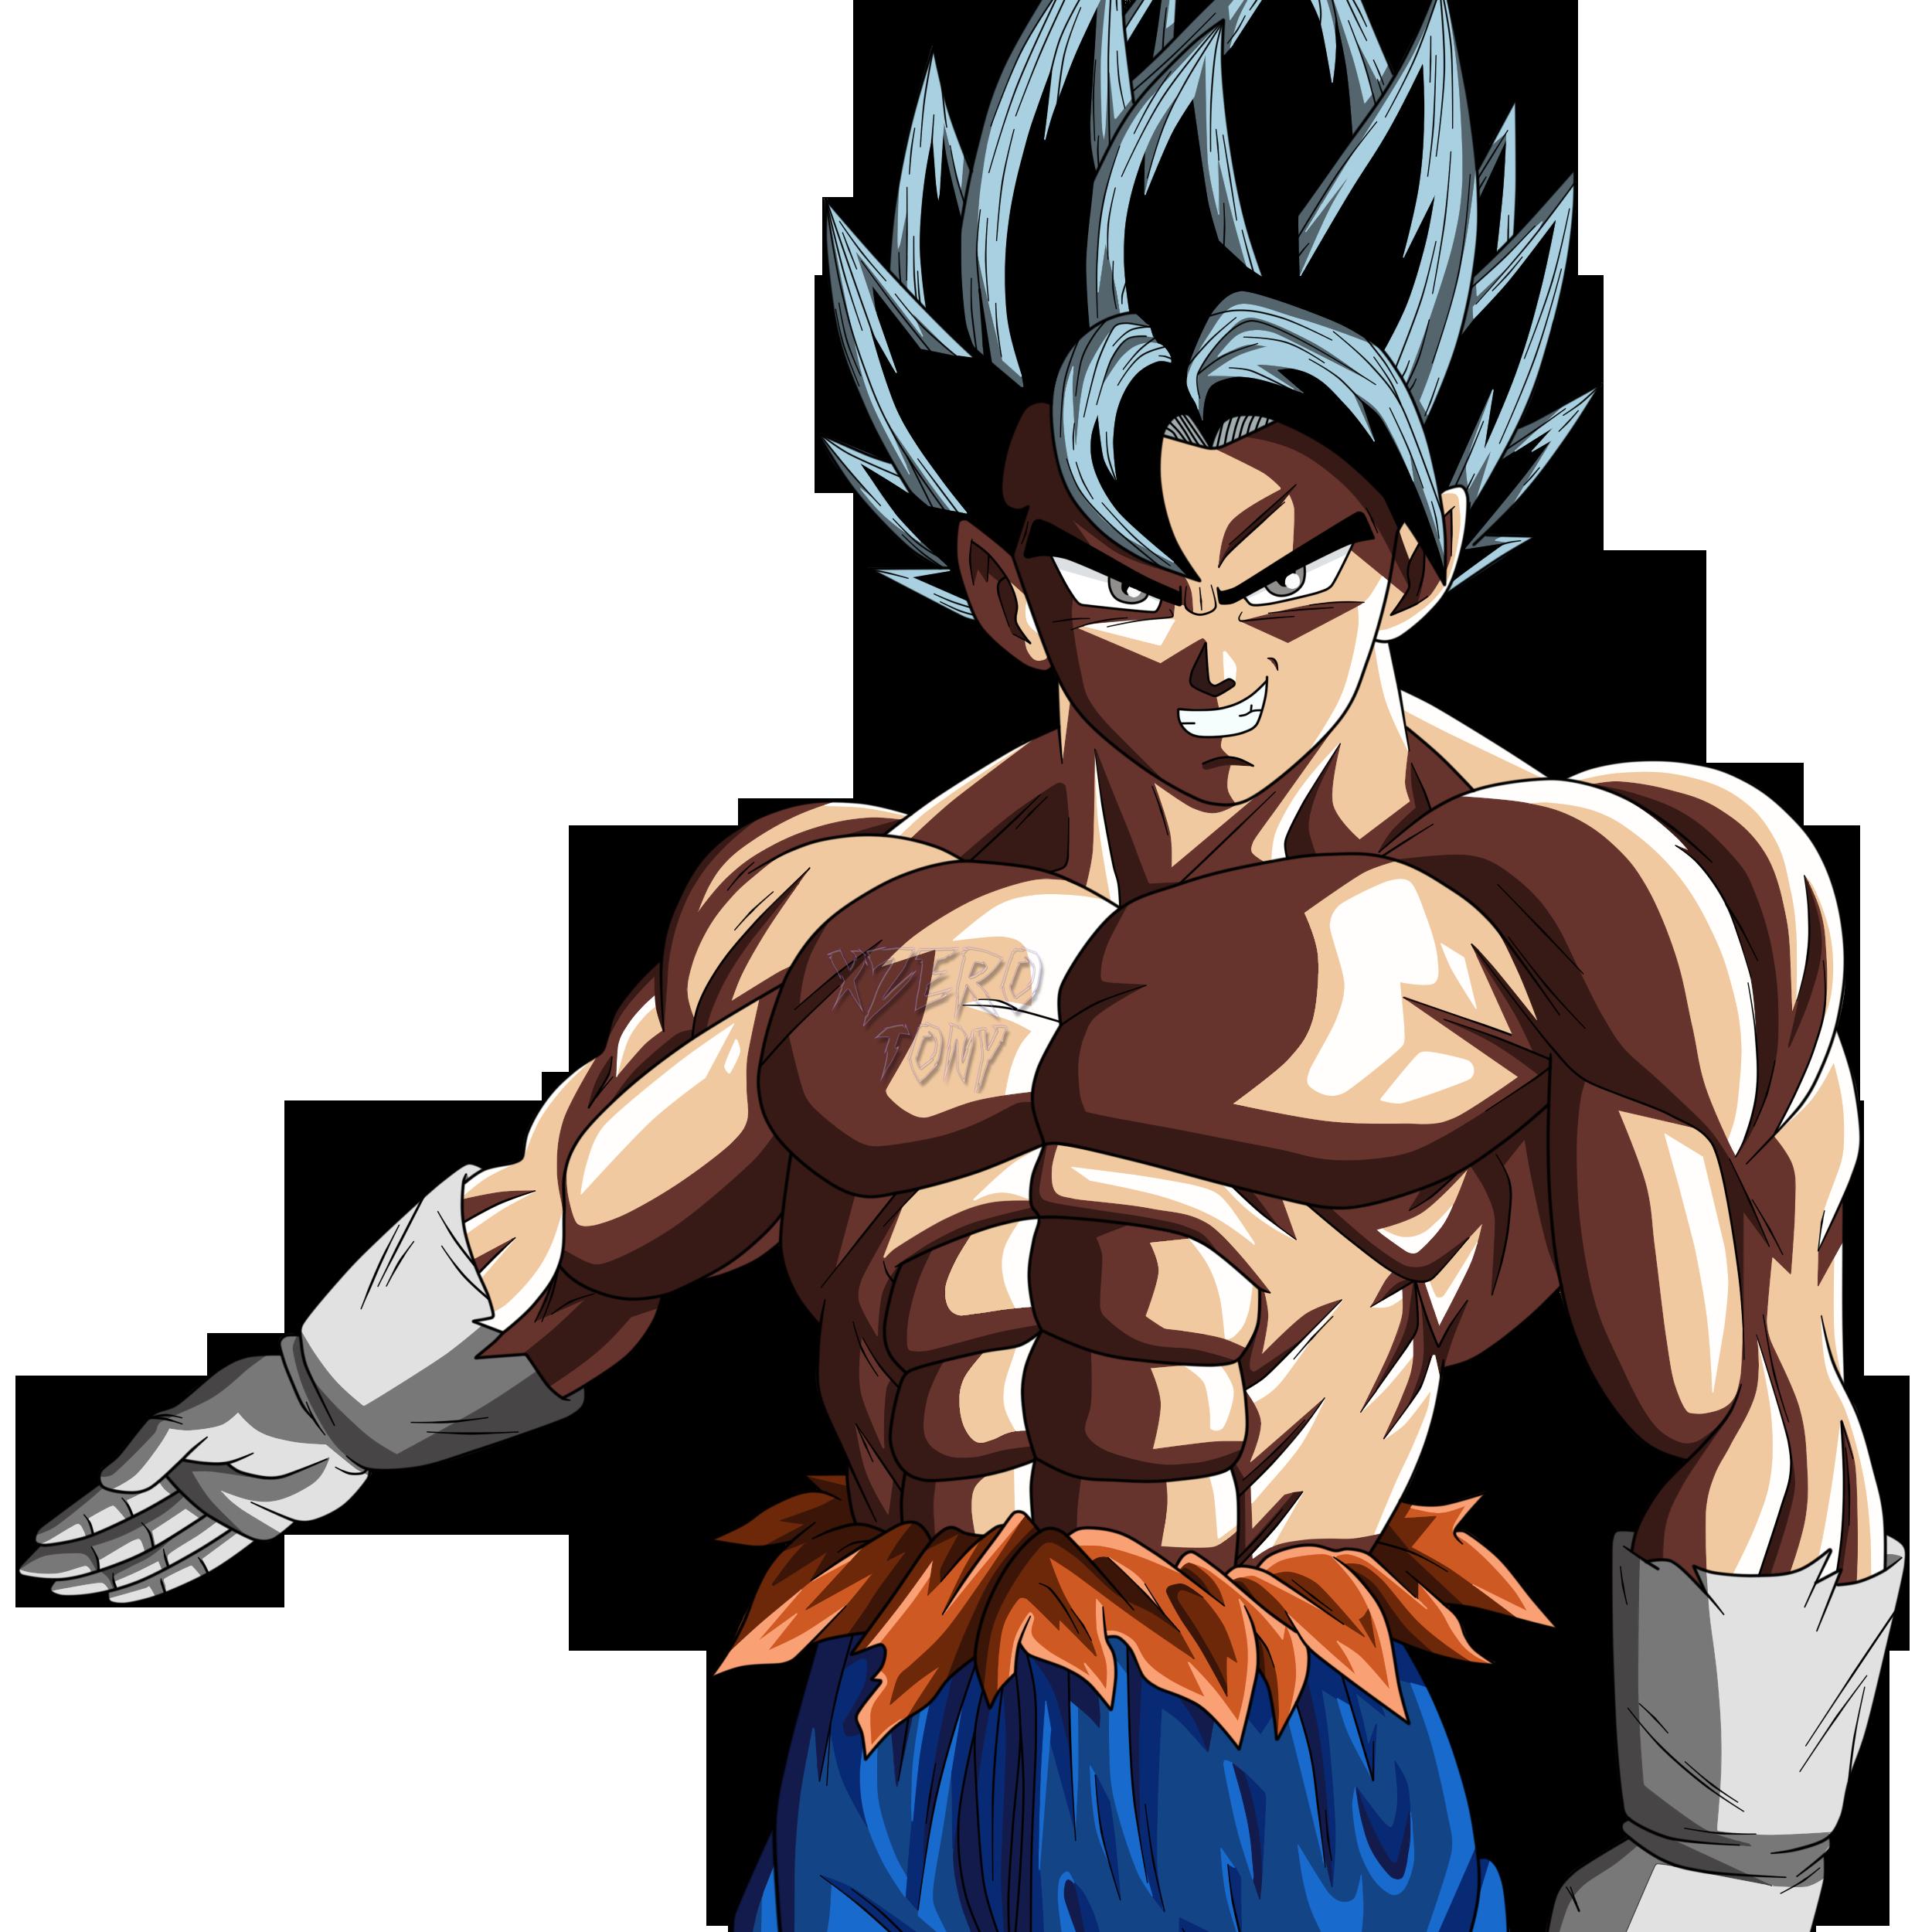 Goku migatte no gokui clipart clip art stock Goku migatte clipart images gallery for free download | MyReal clip ... clip art stock